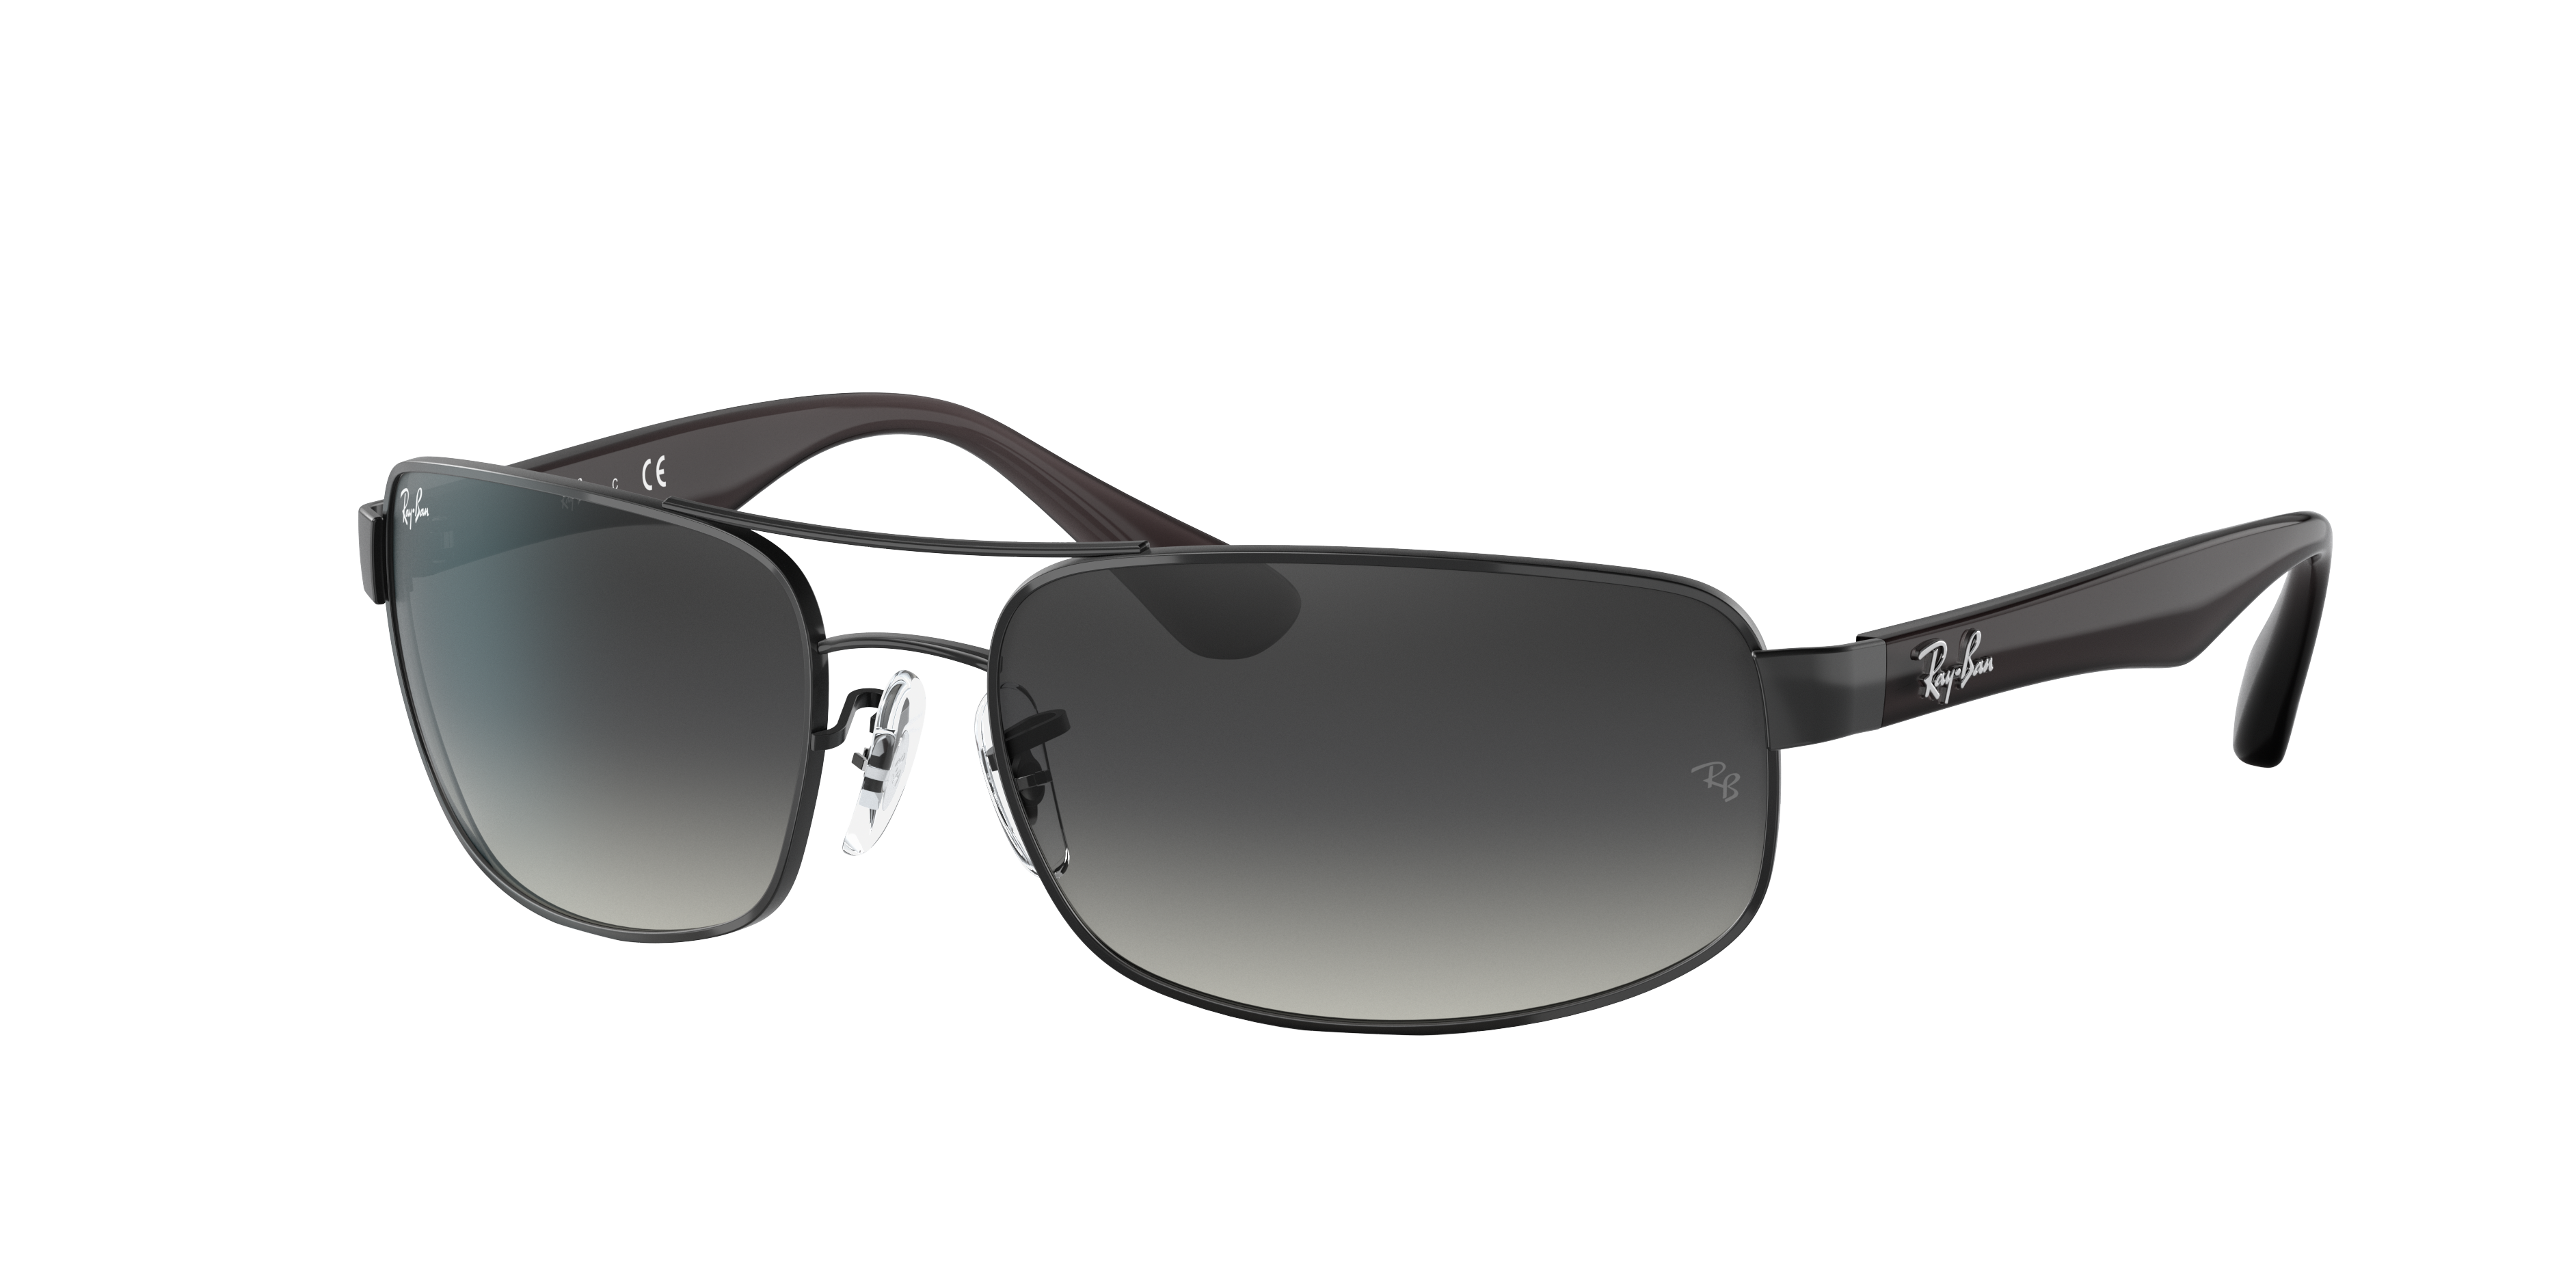 Ray-Ban Rb3445 Grey, Gray Lenses - RB3445